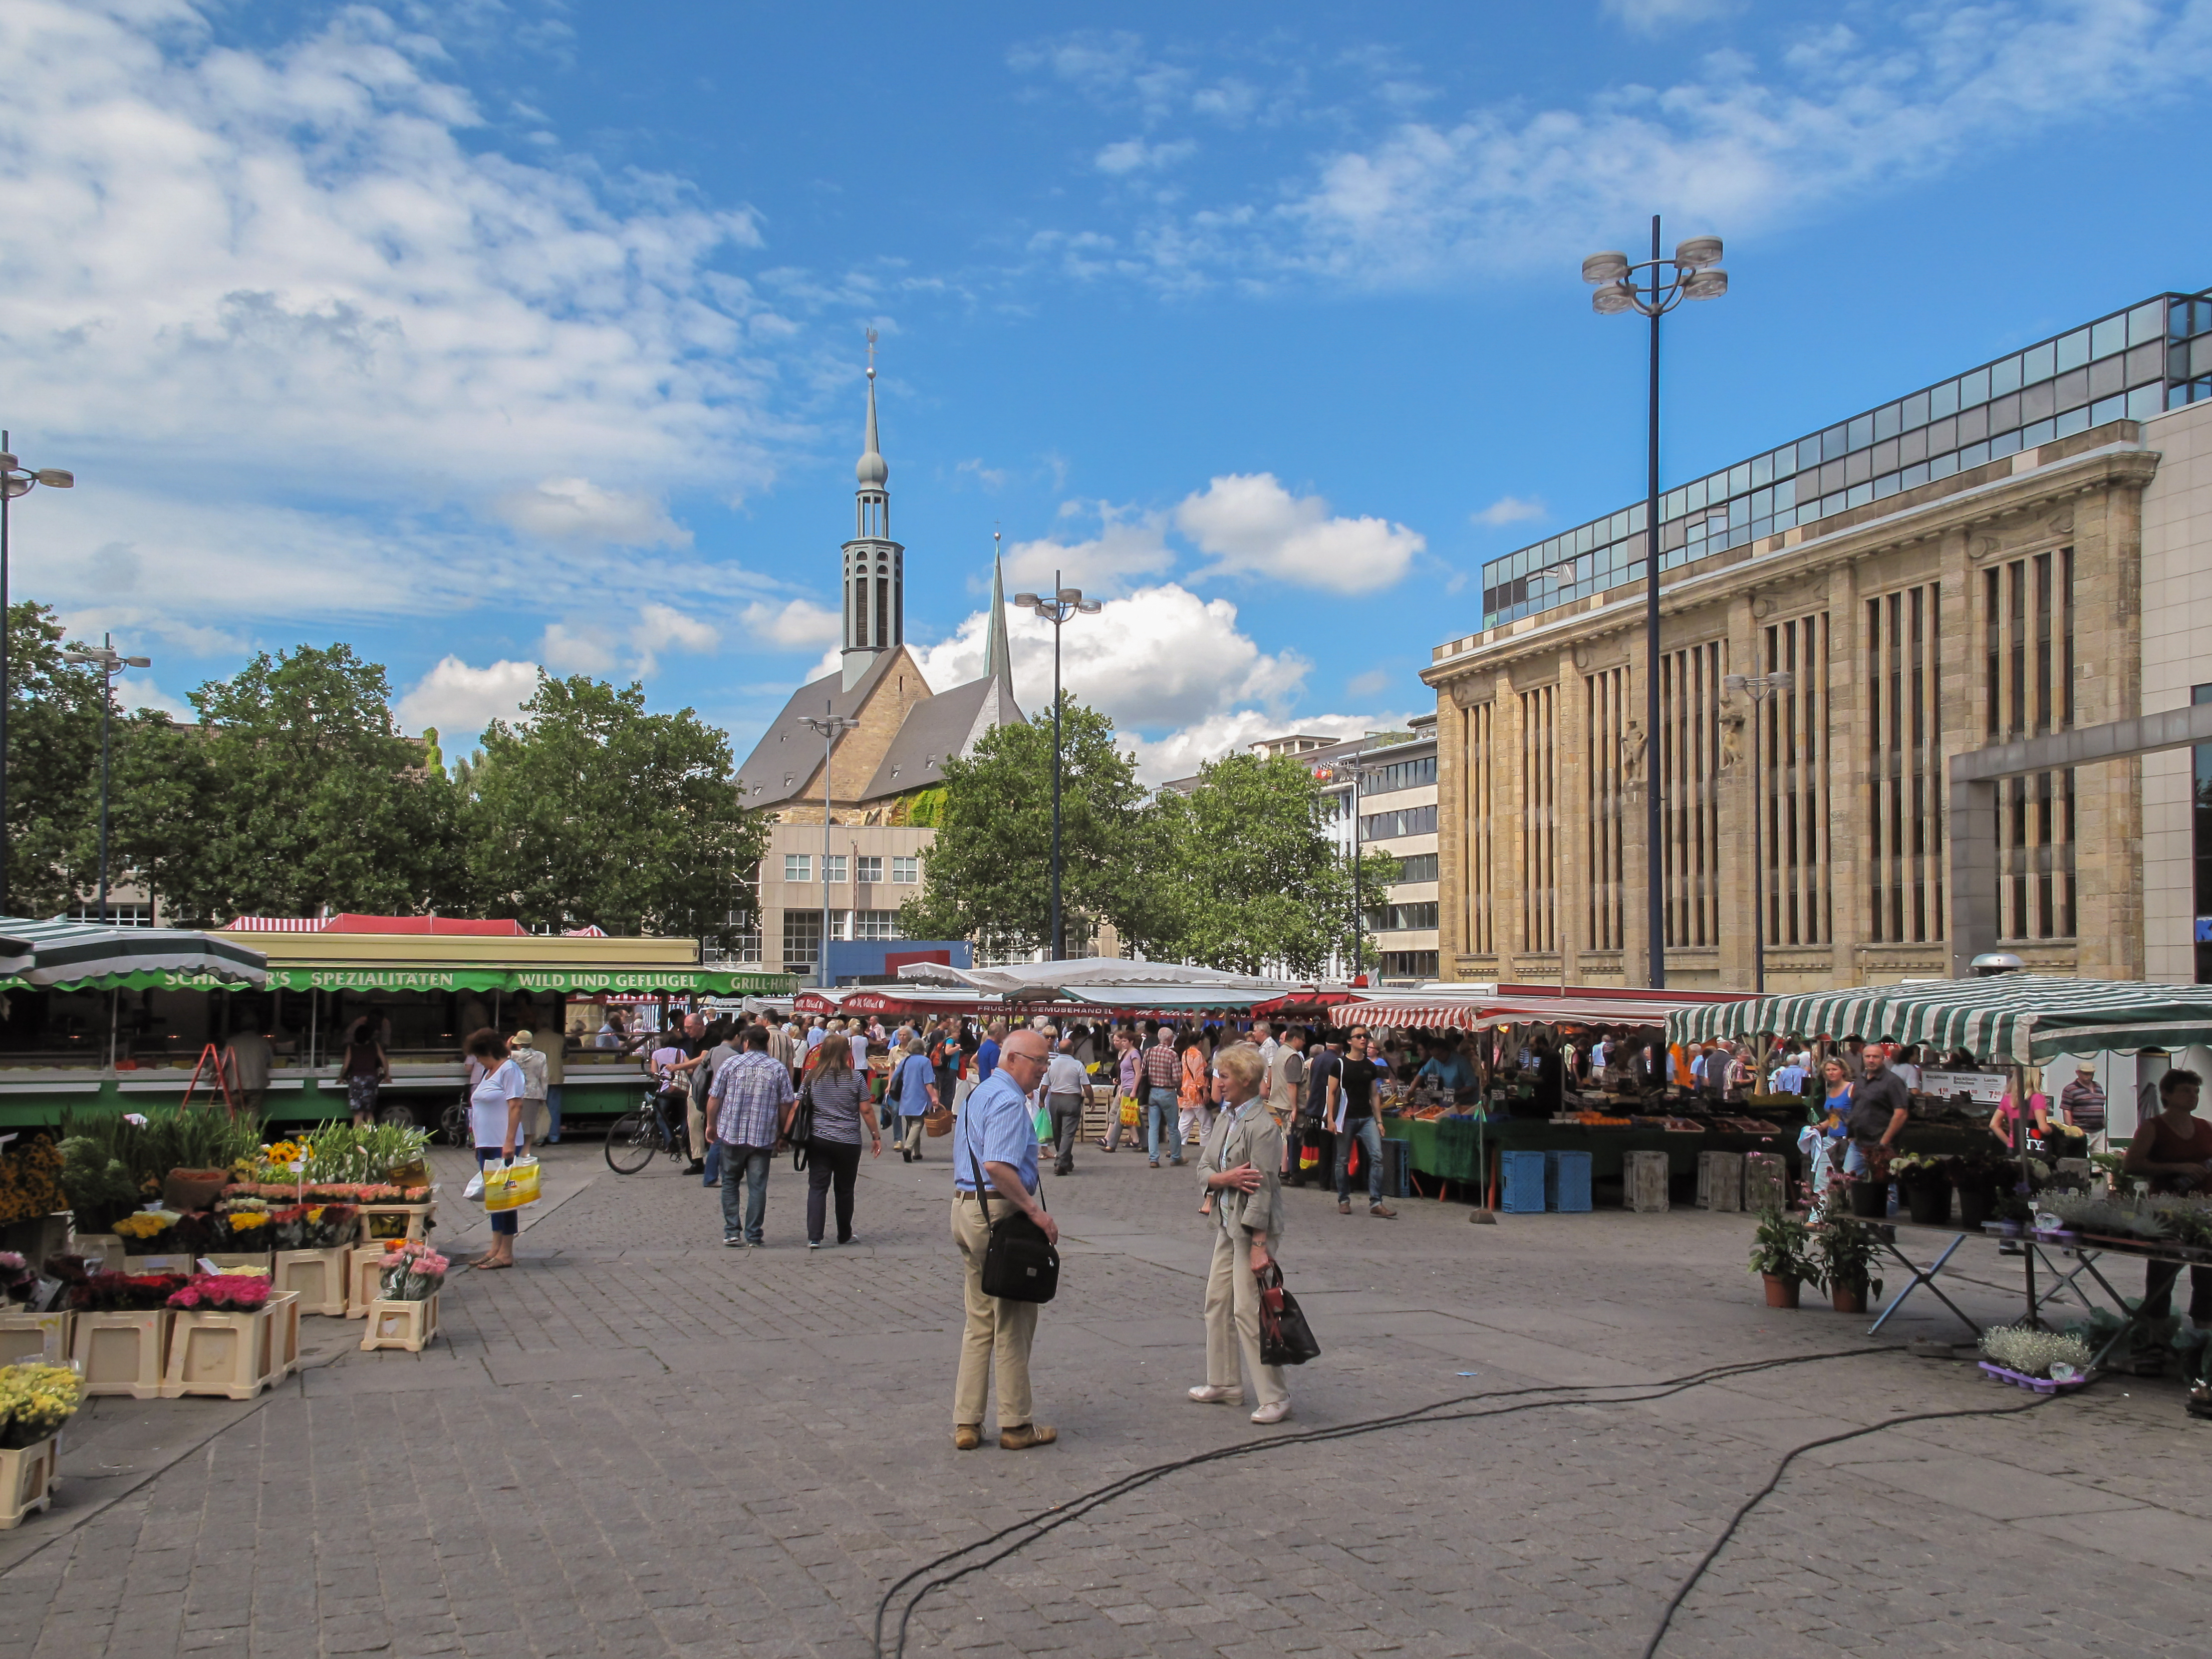 File Dortmund Markt Op De Hansaplatz Foto2 2012 08 04 12